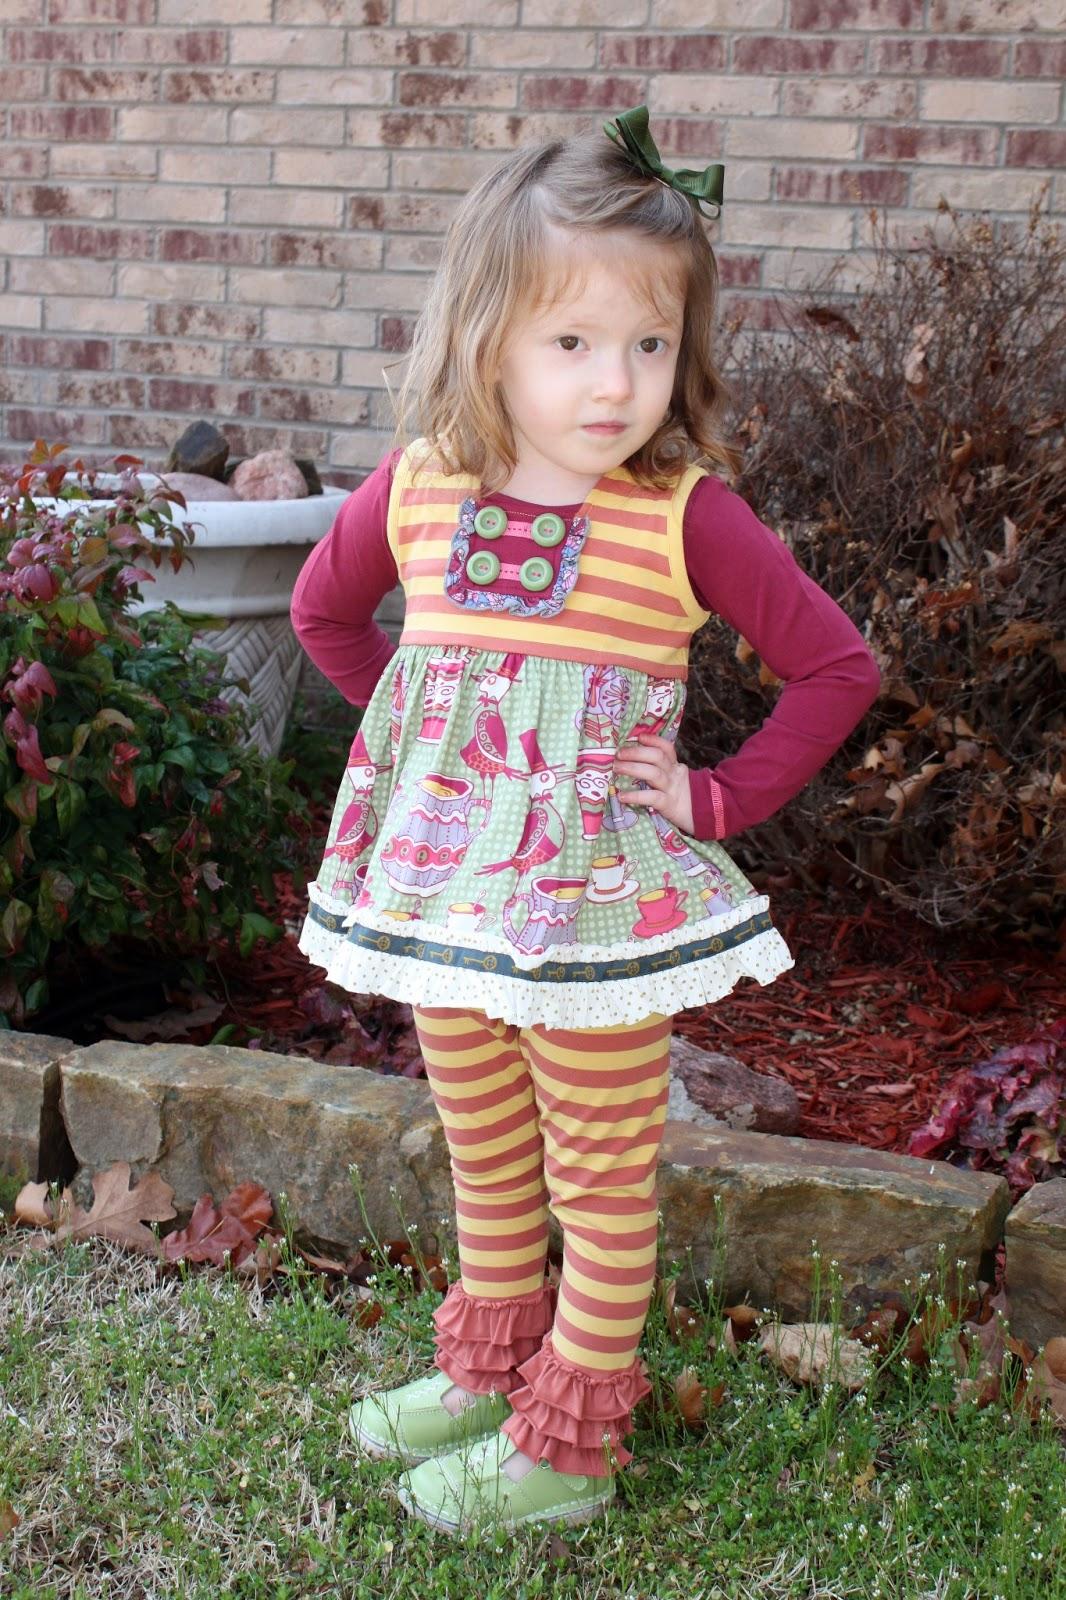 ef2fa26043db *Khloe is wearing Matilda Jane Cabernet Tee, Matilda Jane Sailor Top and Matilda  Jane Goldenrod Leggings (pants). She is wearing Coco Jumbo mint green Mary  ...